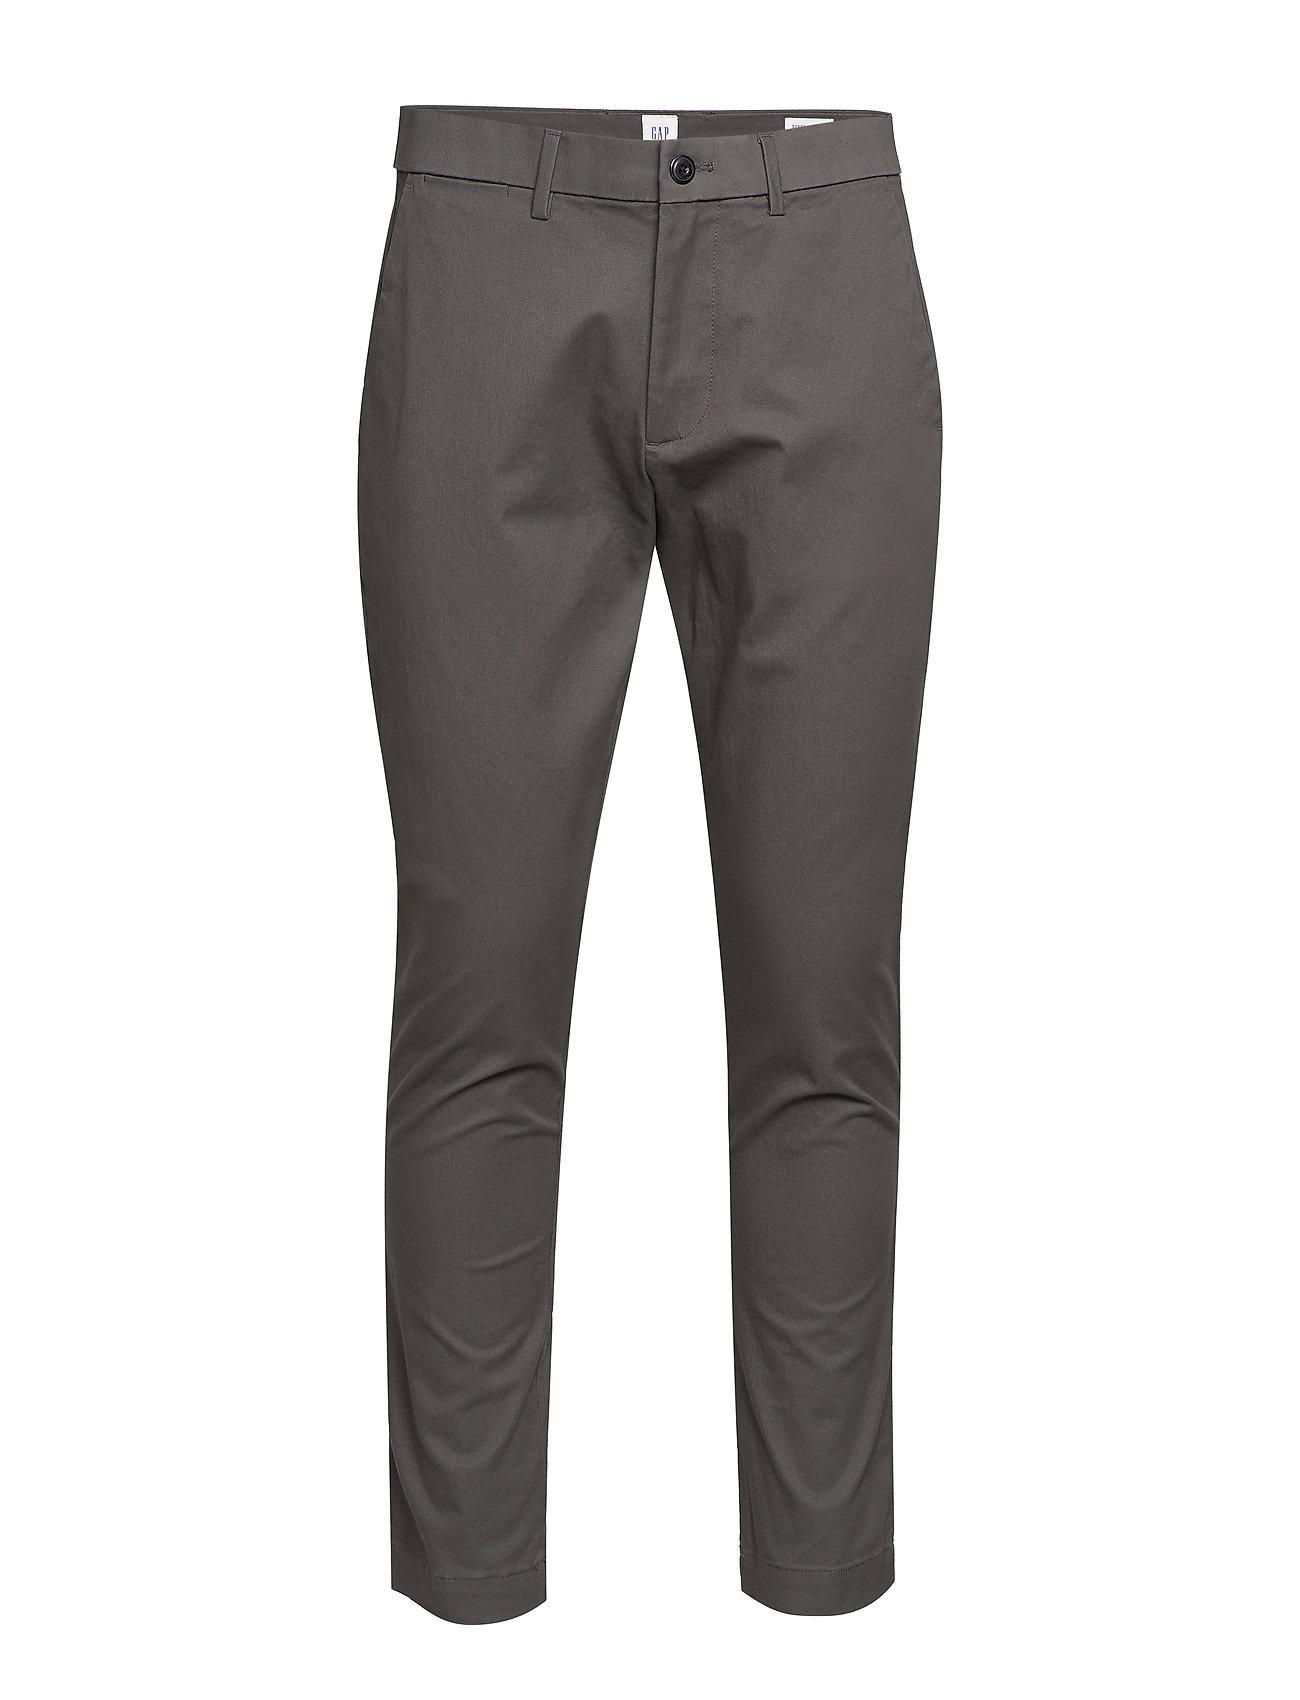 GAP Modern Khakis in Skinny Fit with GapFlex - SOFT BLACK